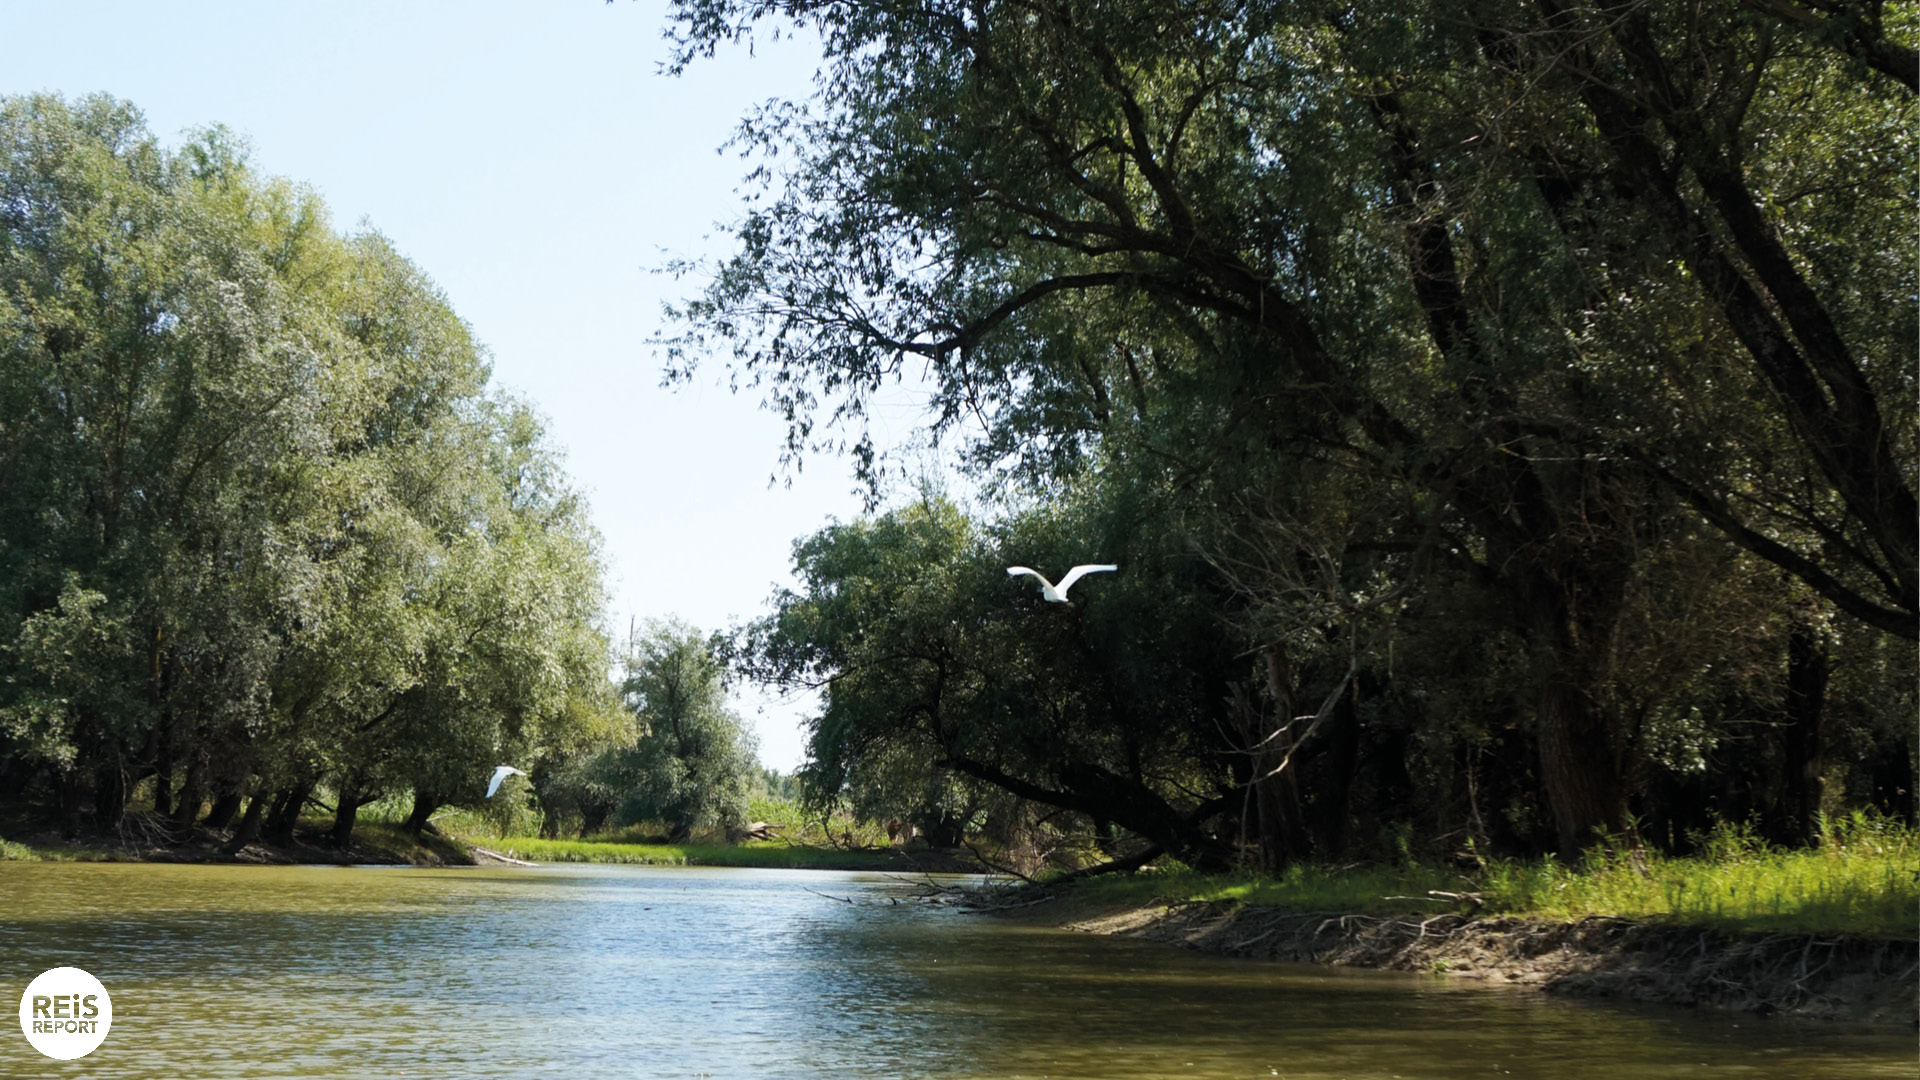 Kopački Rit kroatie natuurpark